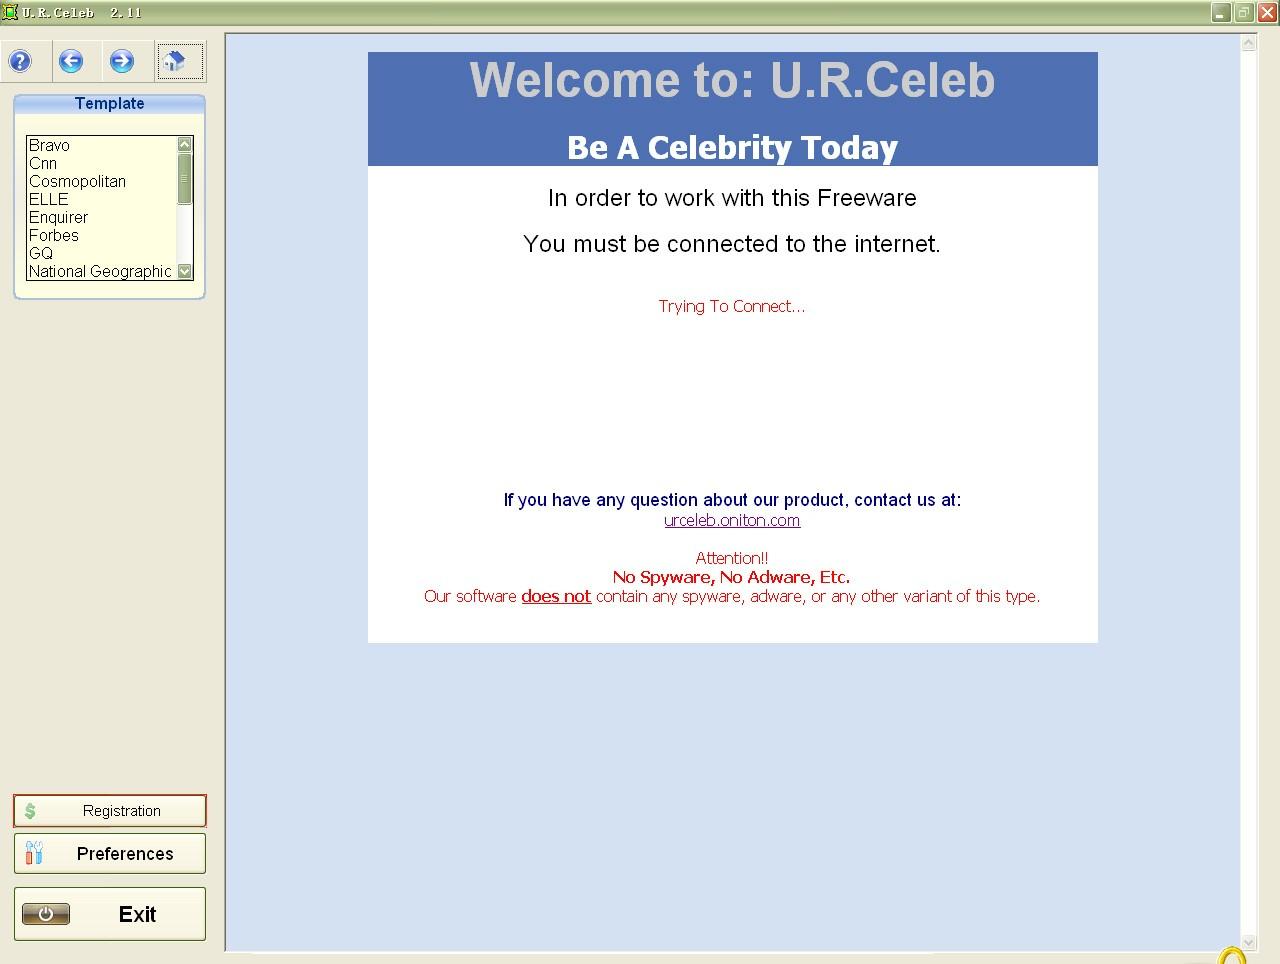 U.R.Celeb bd magazine